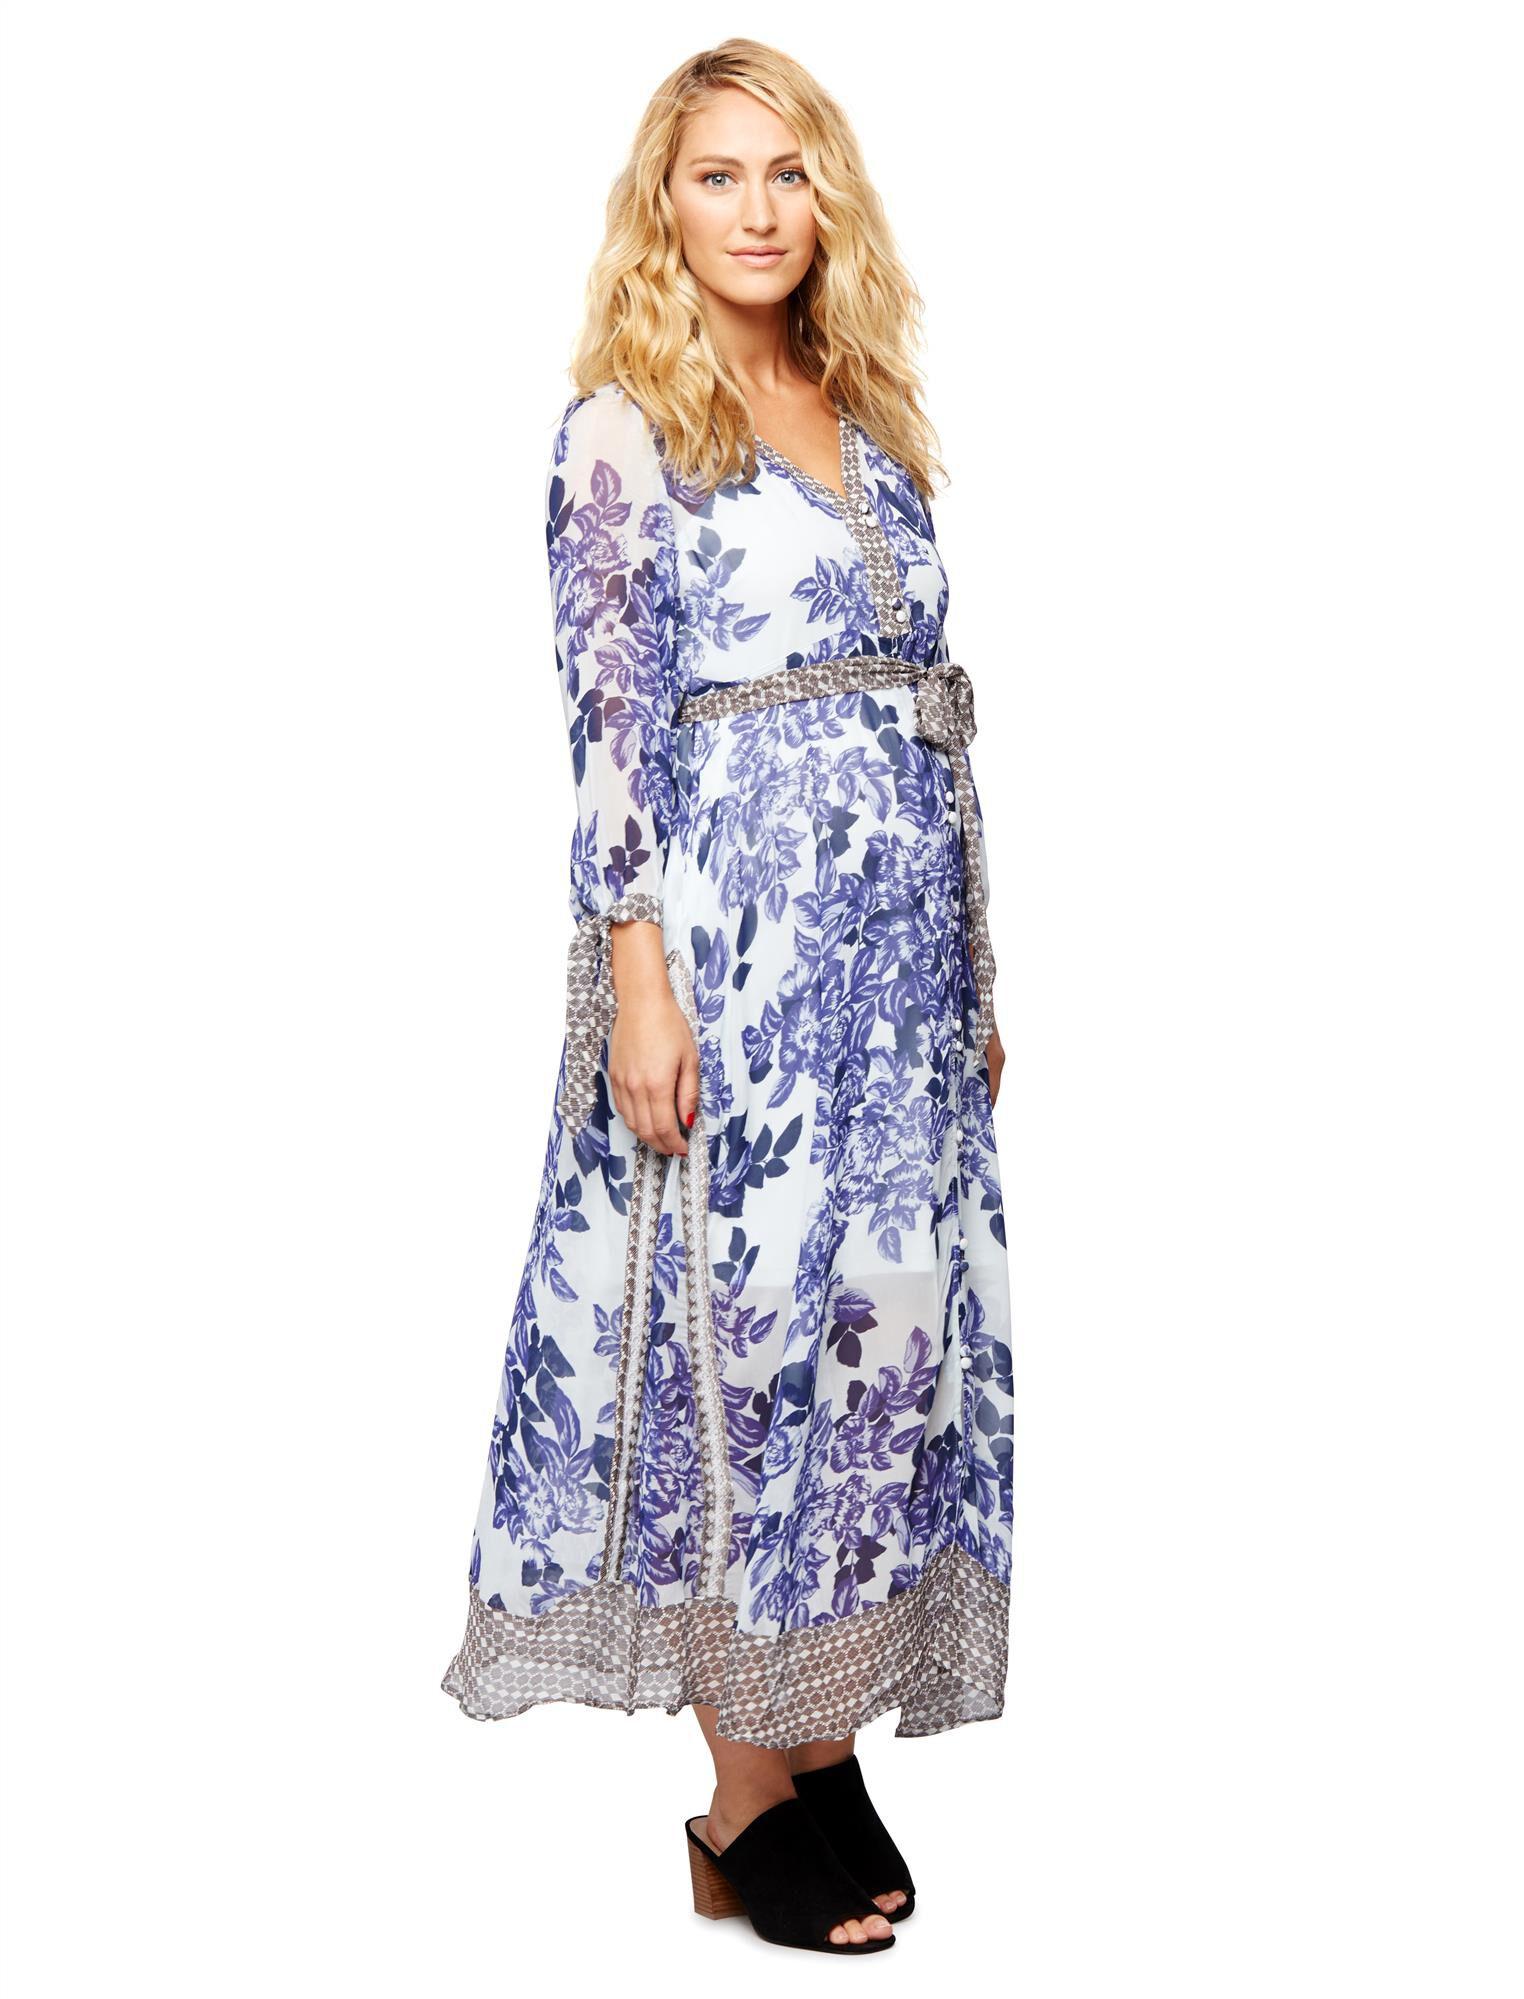 Pretty Floral Print Maternity Dress